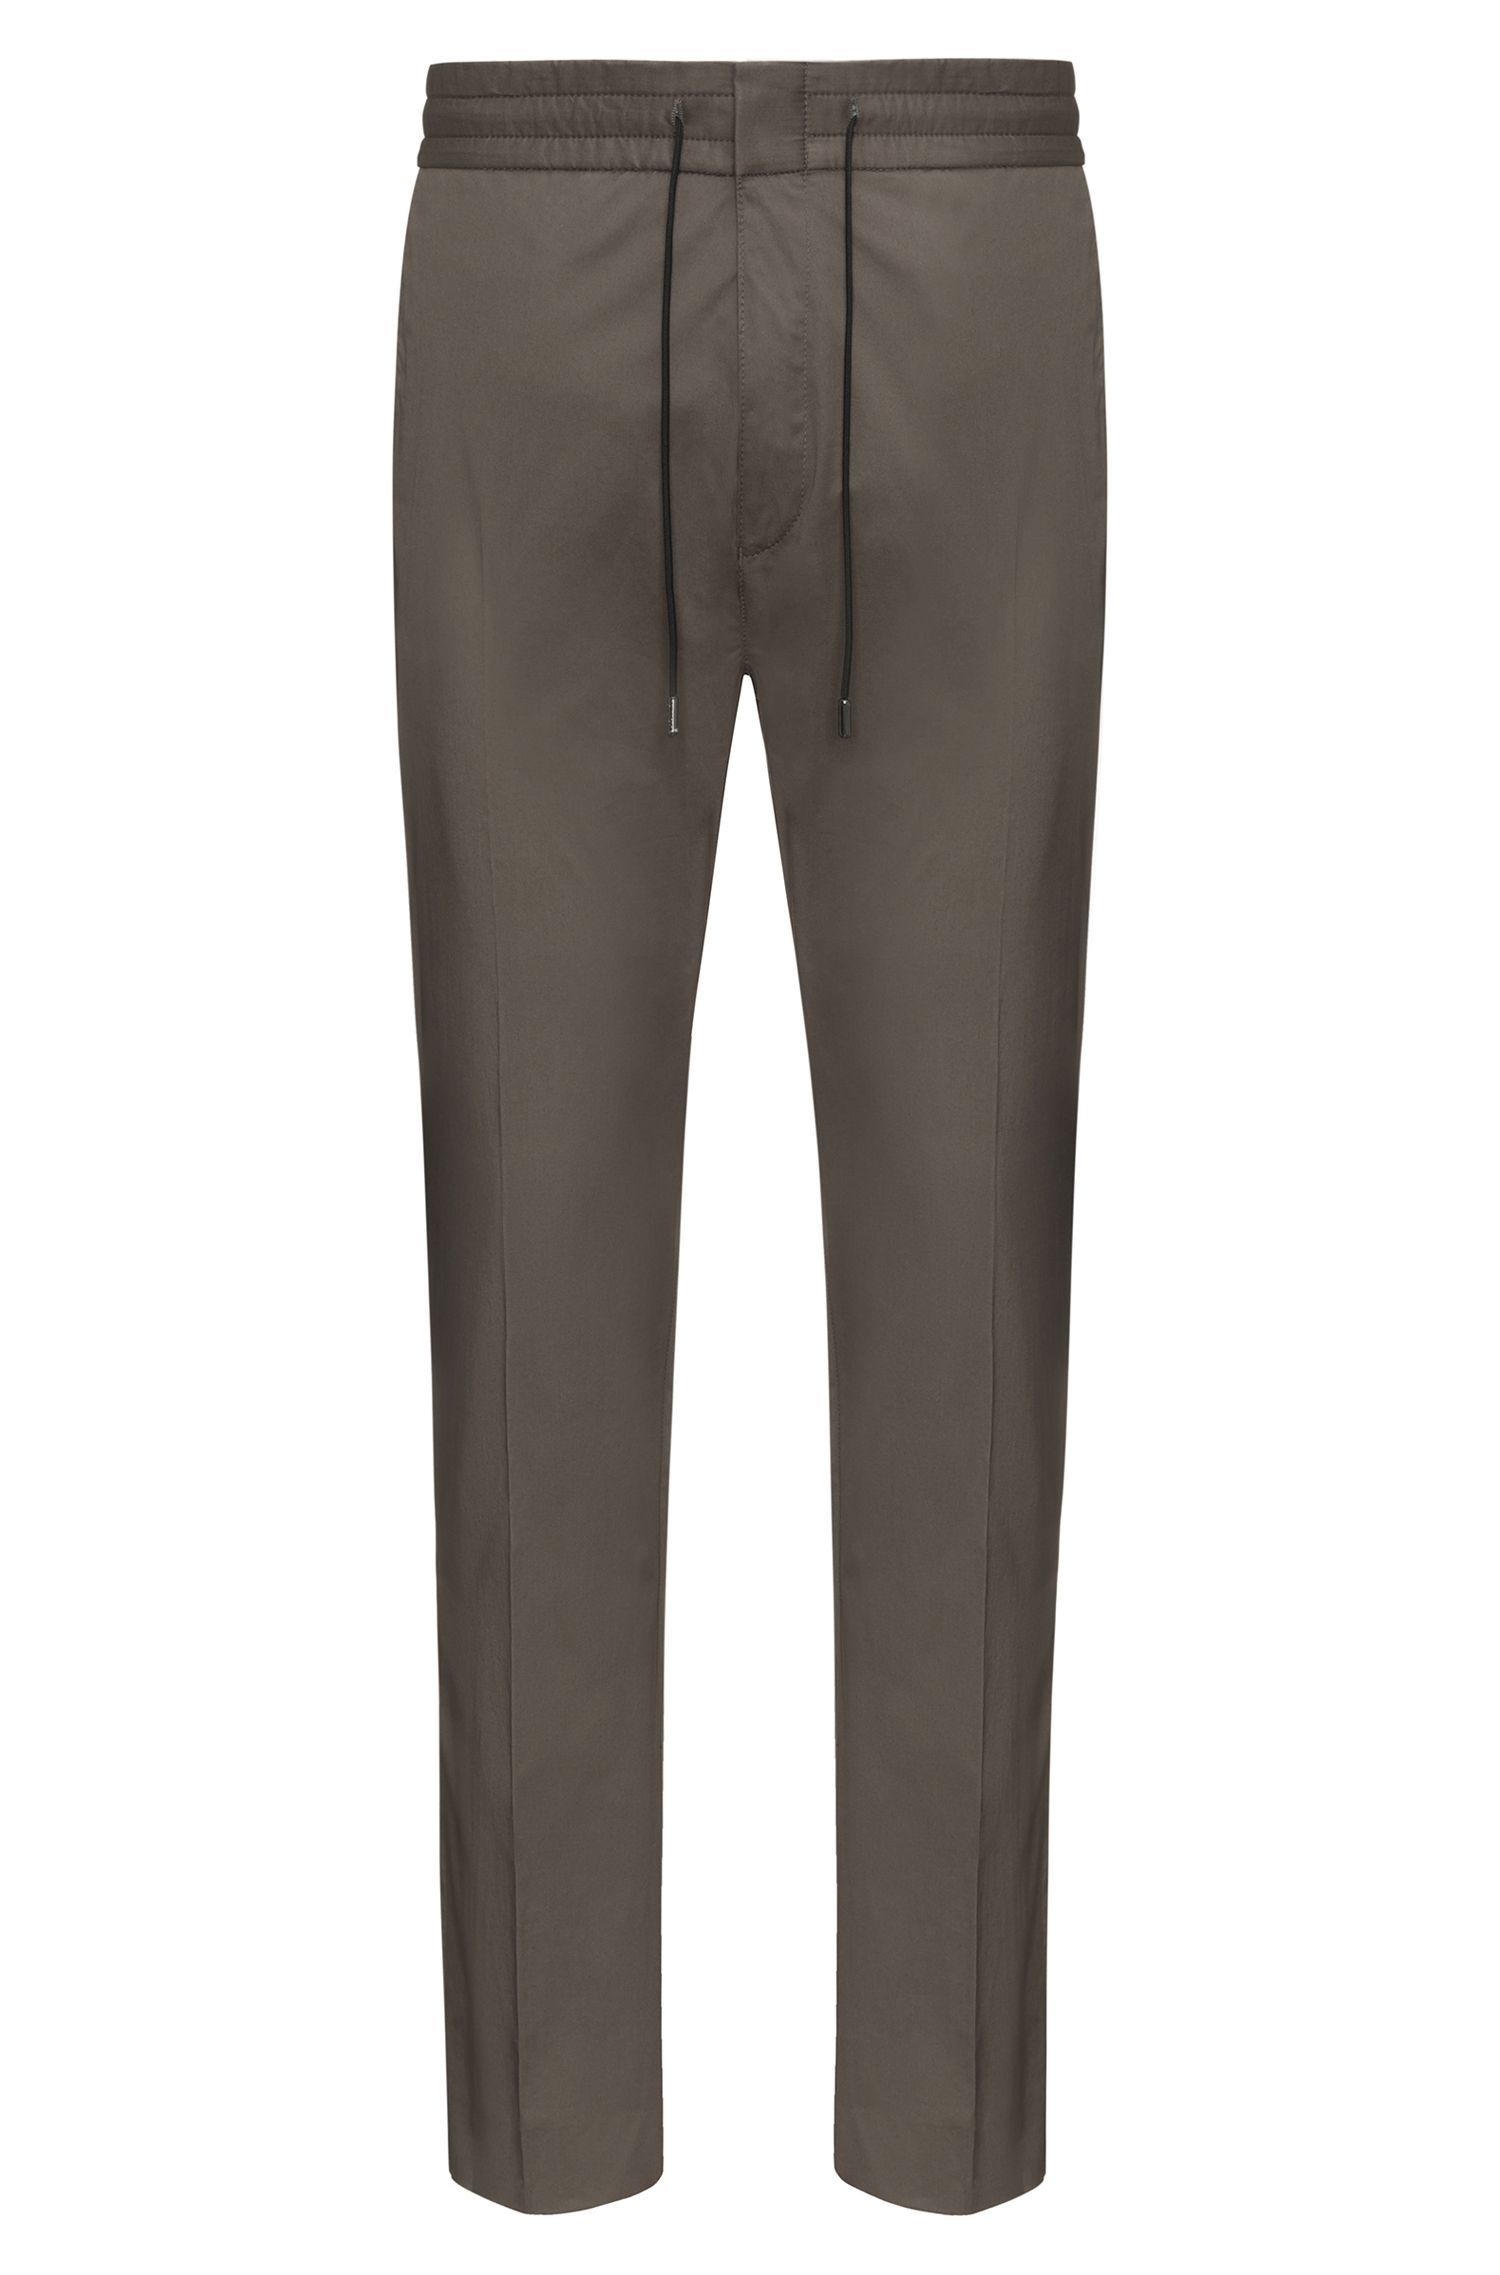 Pantaloni tapered fit in cotone manocarta